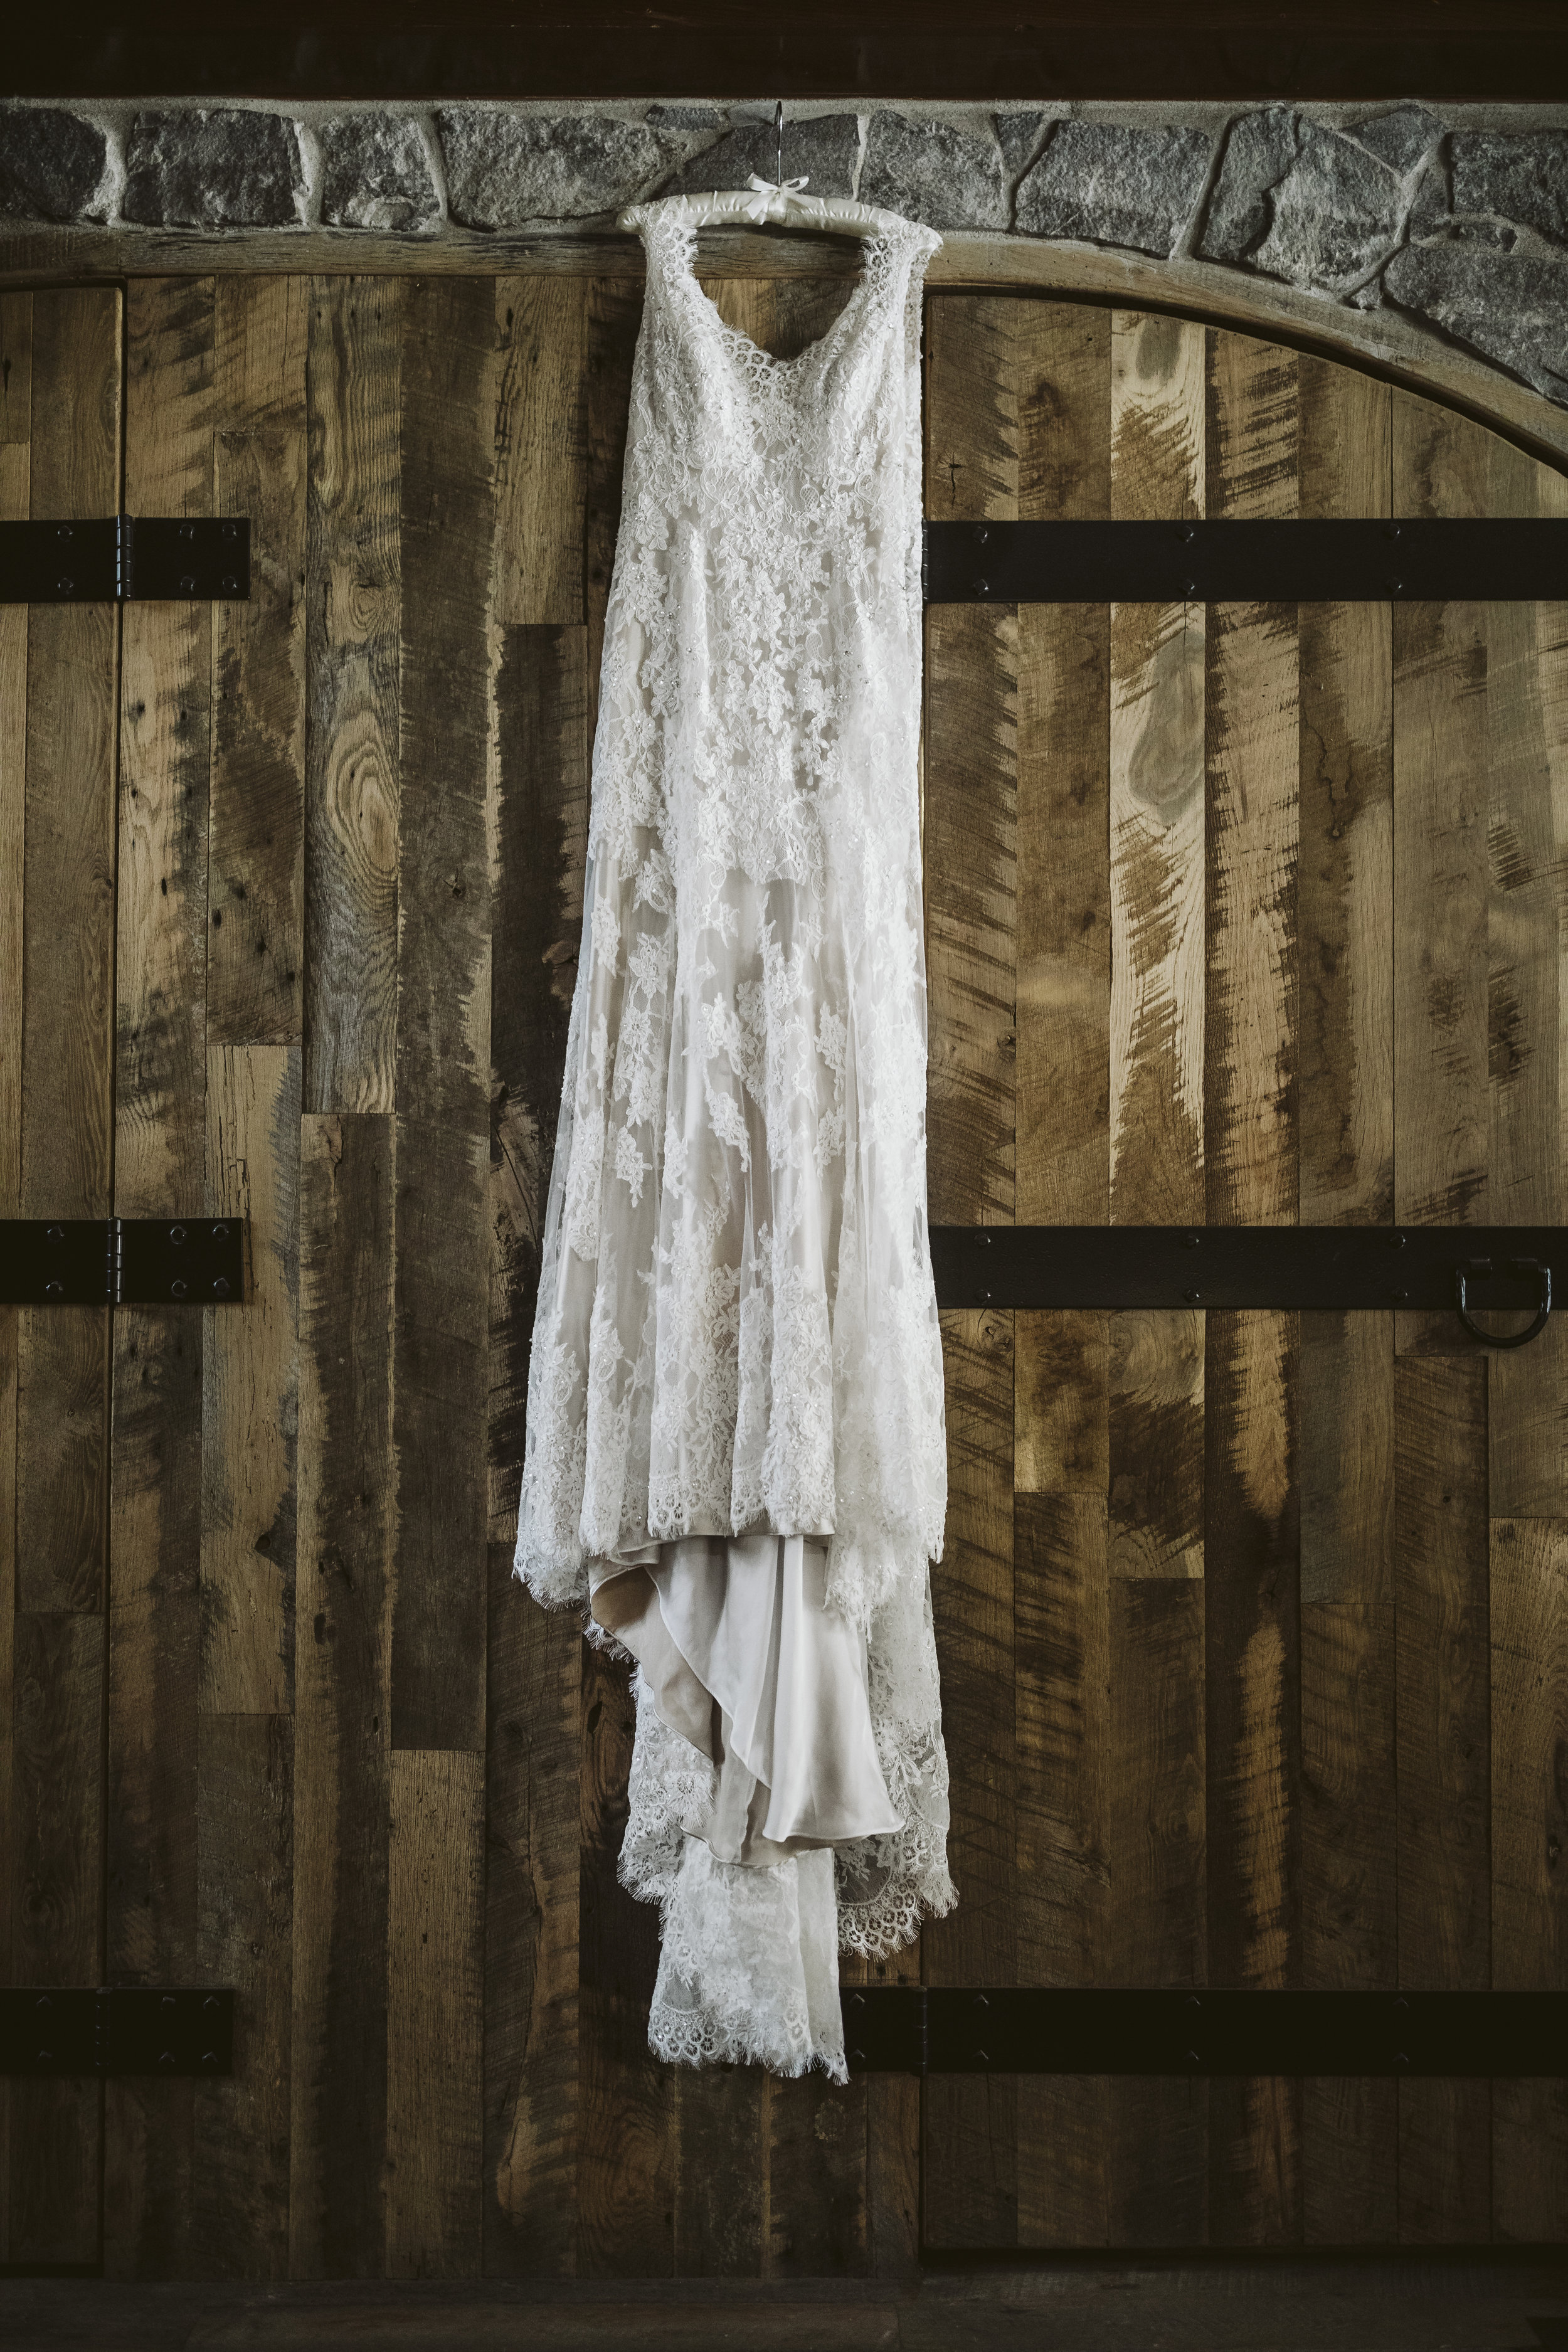 0M7A2485vild-vild photography-photography-wedding-wedding photography-tahoe-lake tahoe-lake tahoe wedding photographer-nevada wedding photographer-mountain wedding.jpg